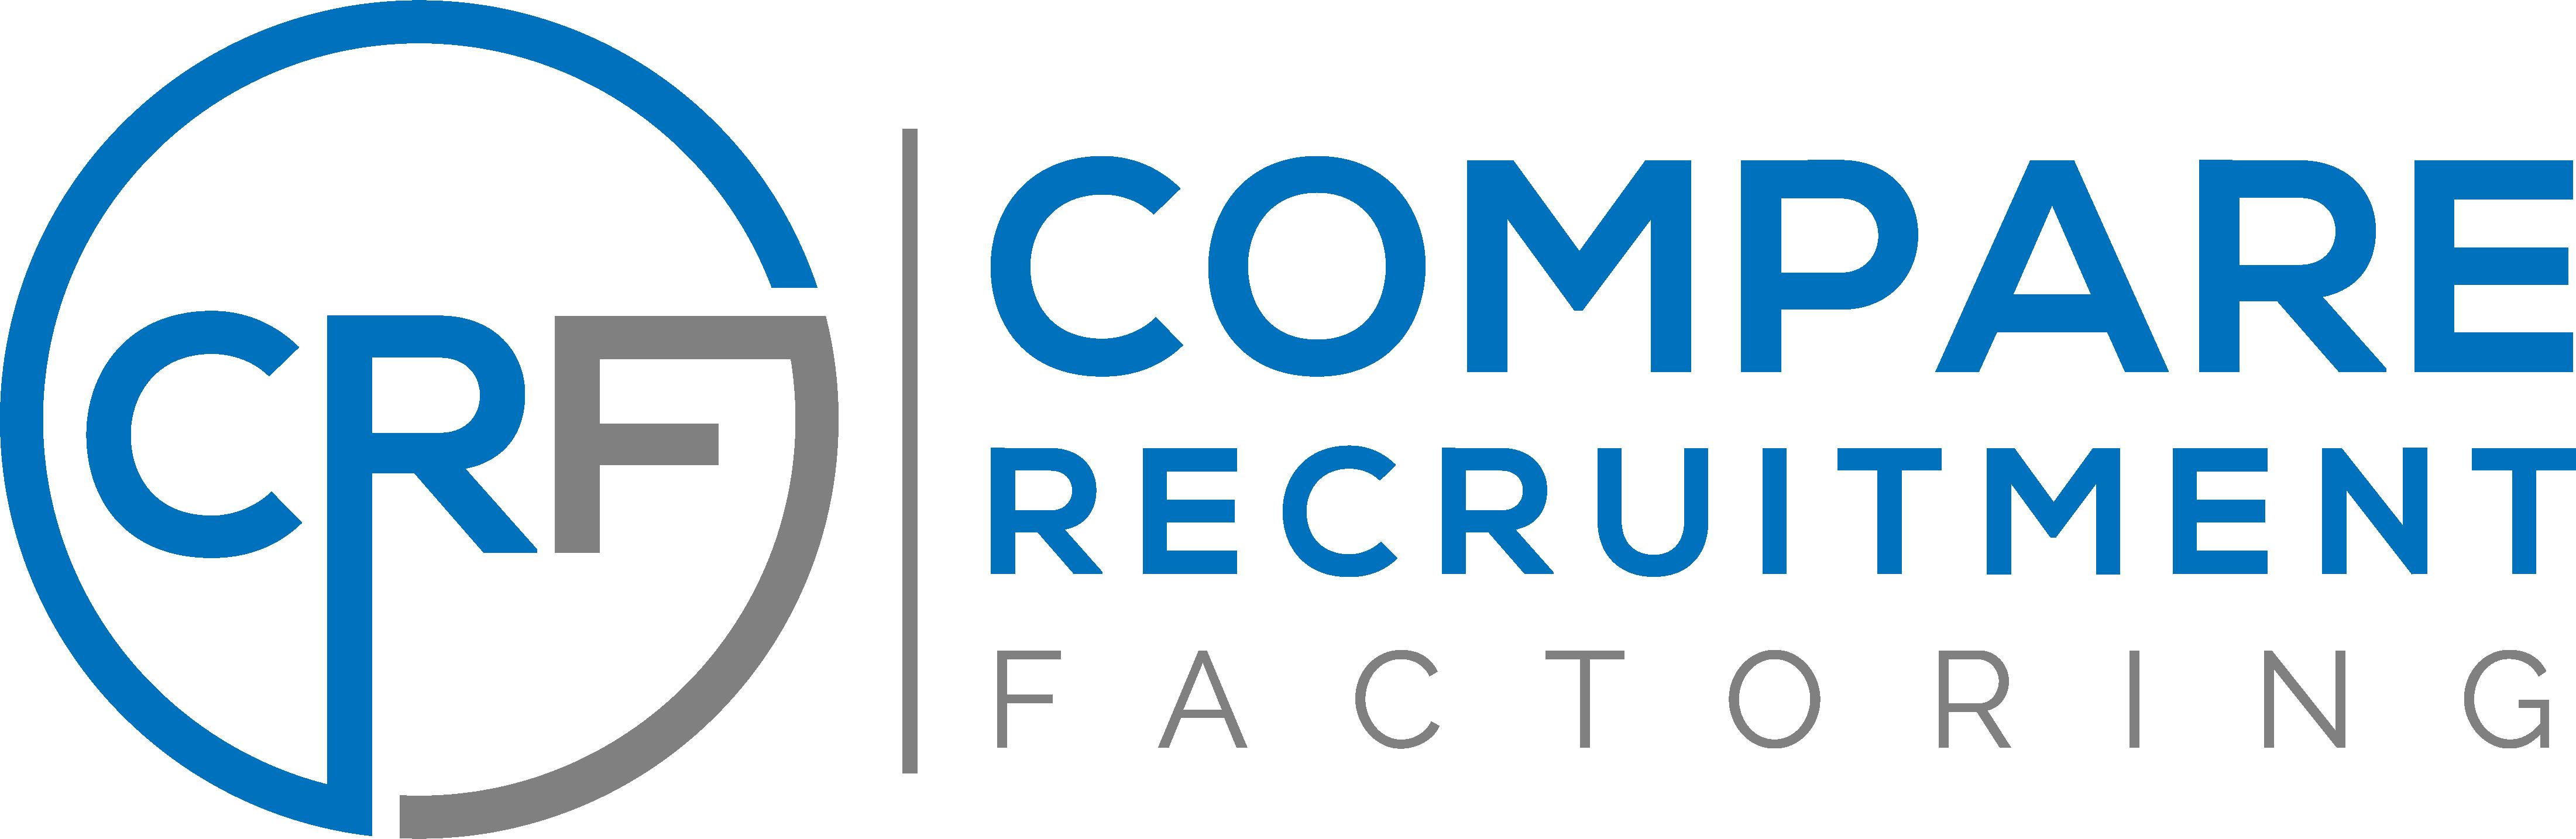 Compare Recruitment Factoring - UK Specialist Factoring for Recruitment Agencies